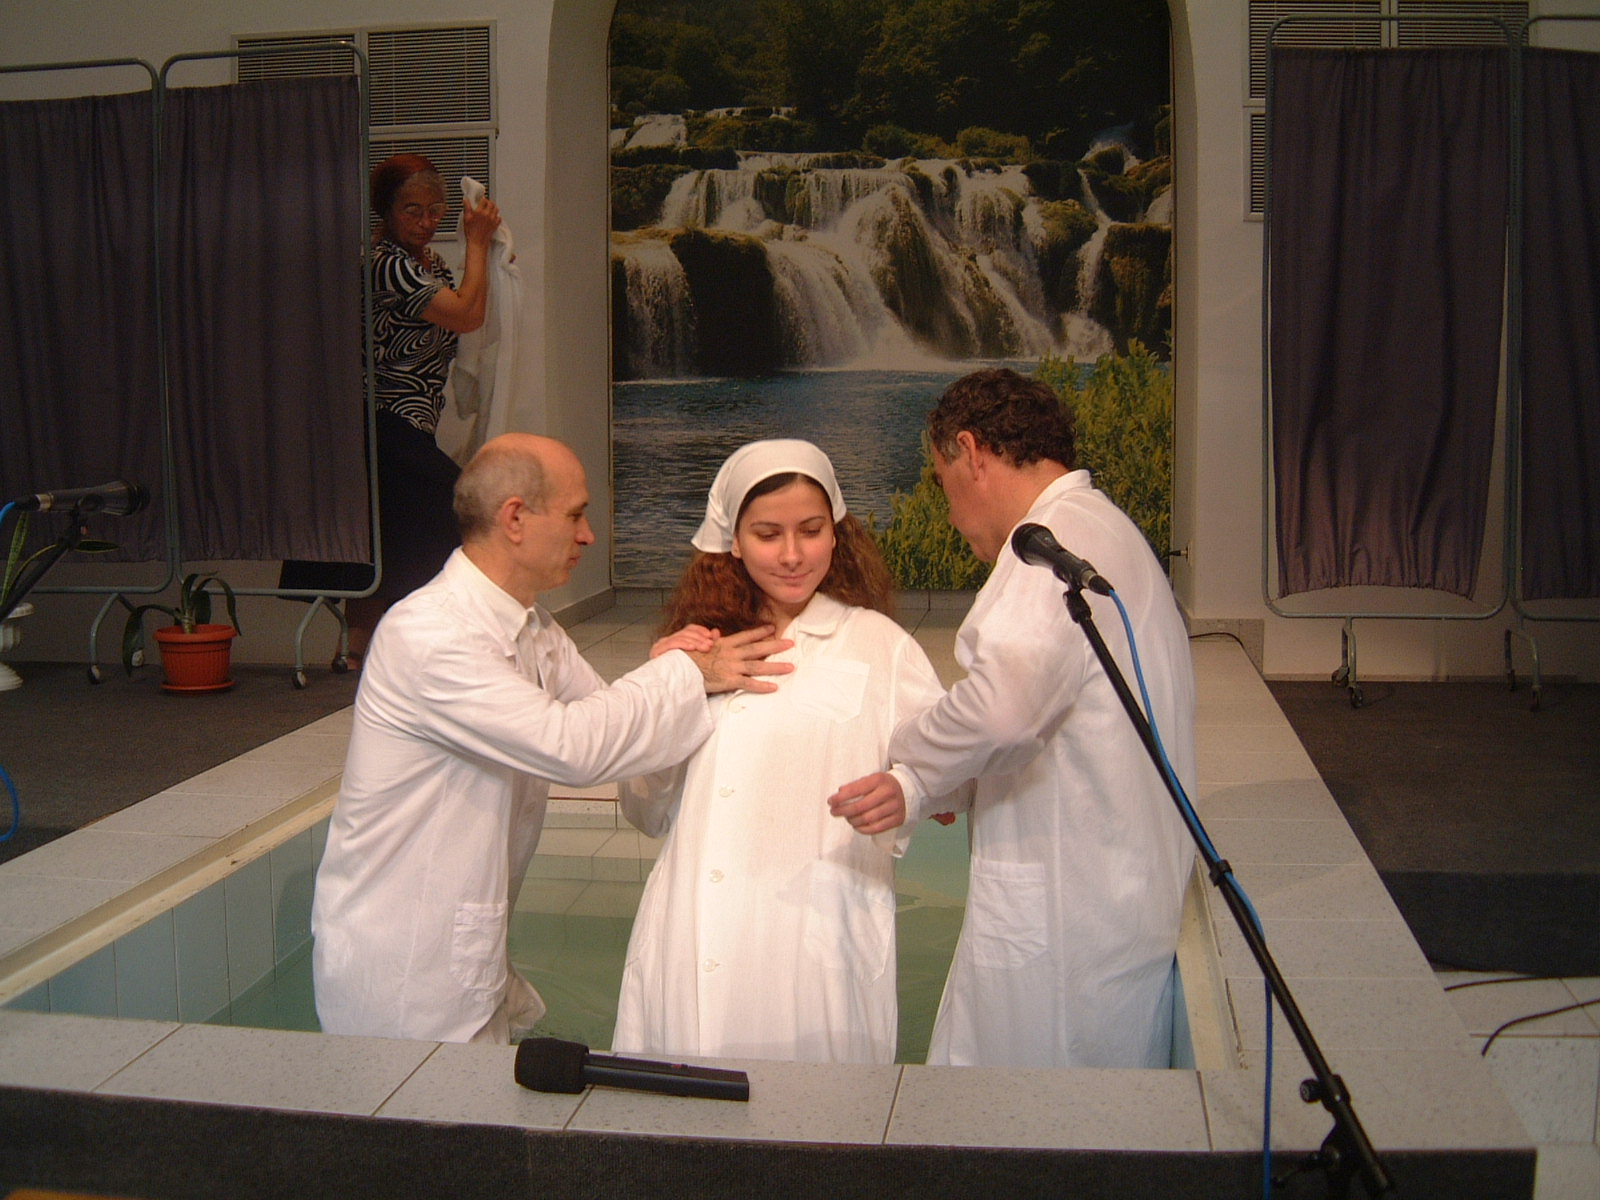 SORA NICOLETA NANAU IN TIMPUL 1 AL BOTEZULUI 22 AUGUST 2003